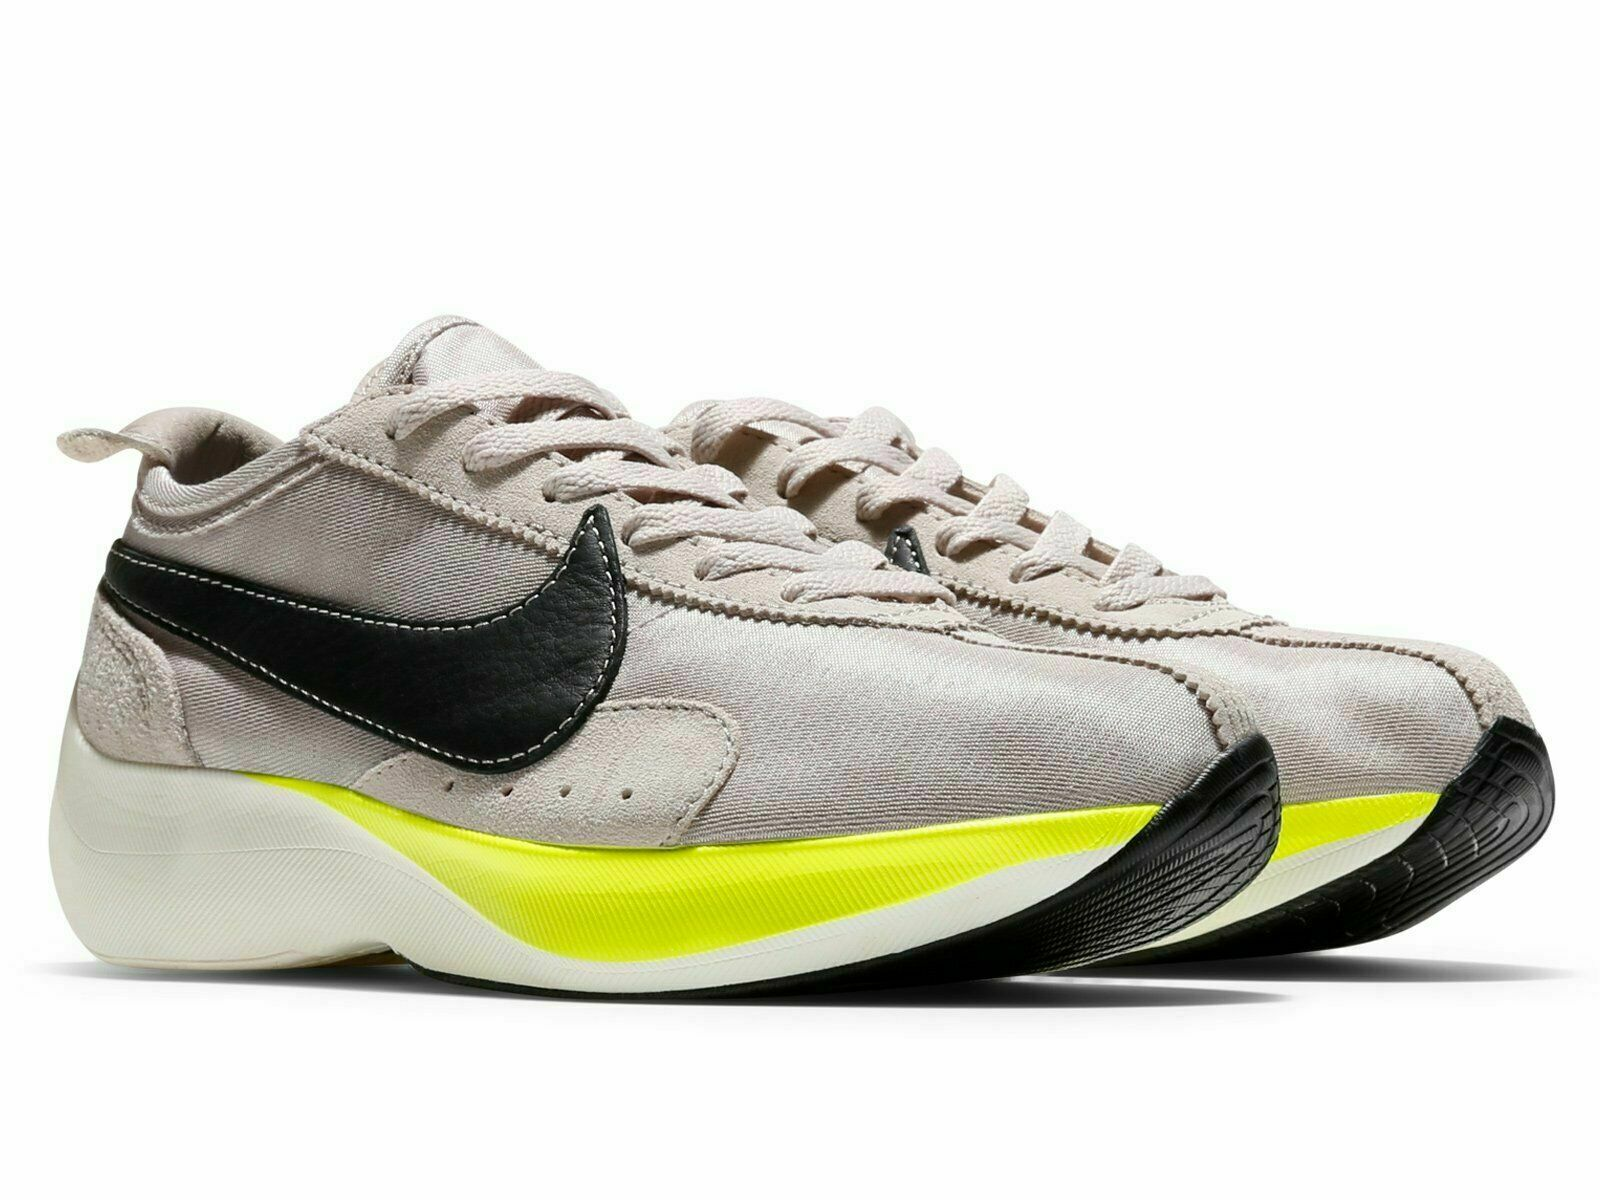 New Nike MOON RACER Running shoes React Foam  AQ4121 200 Multi-Men sizes